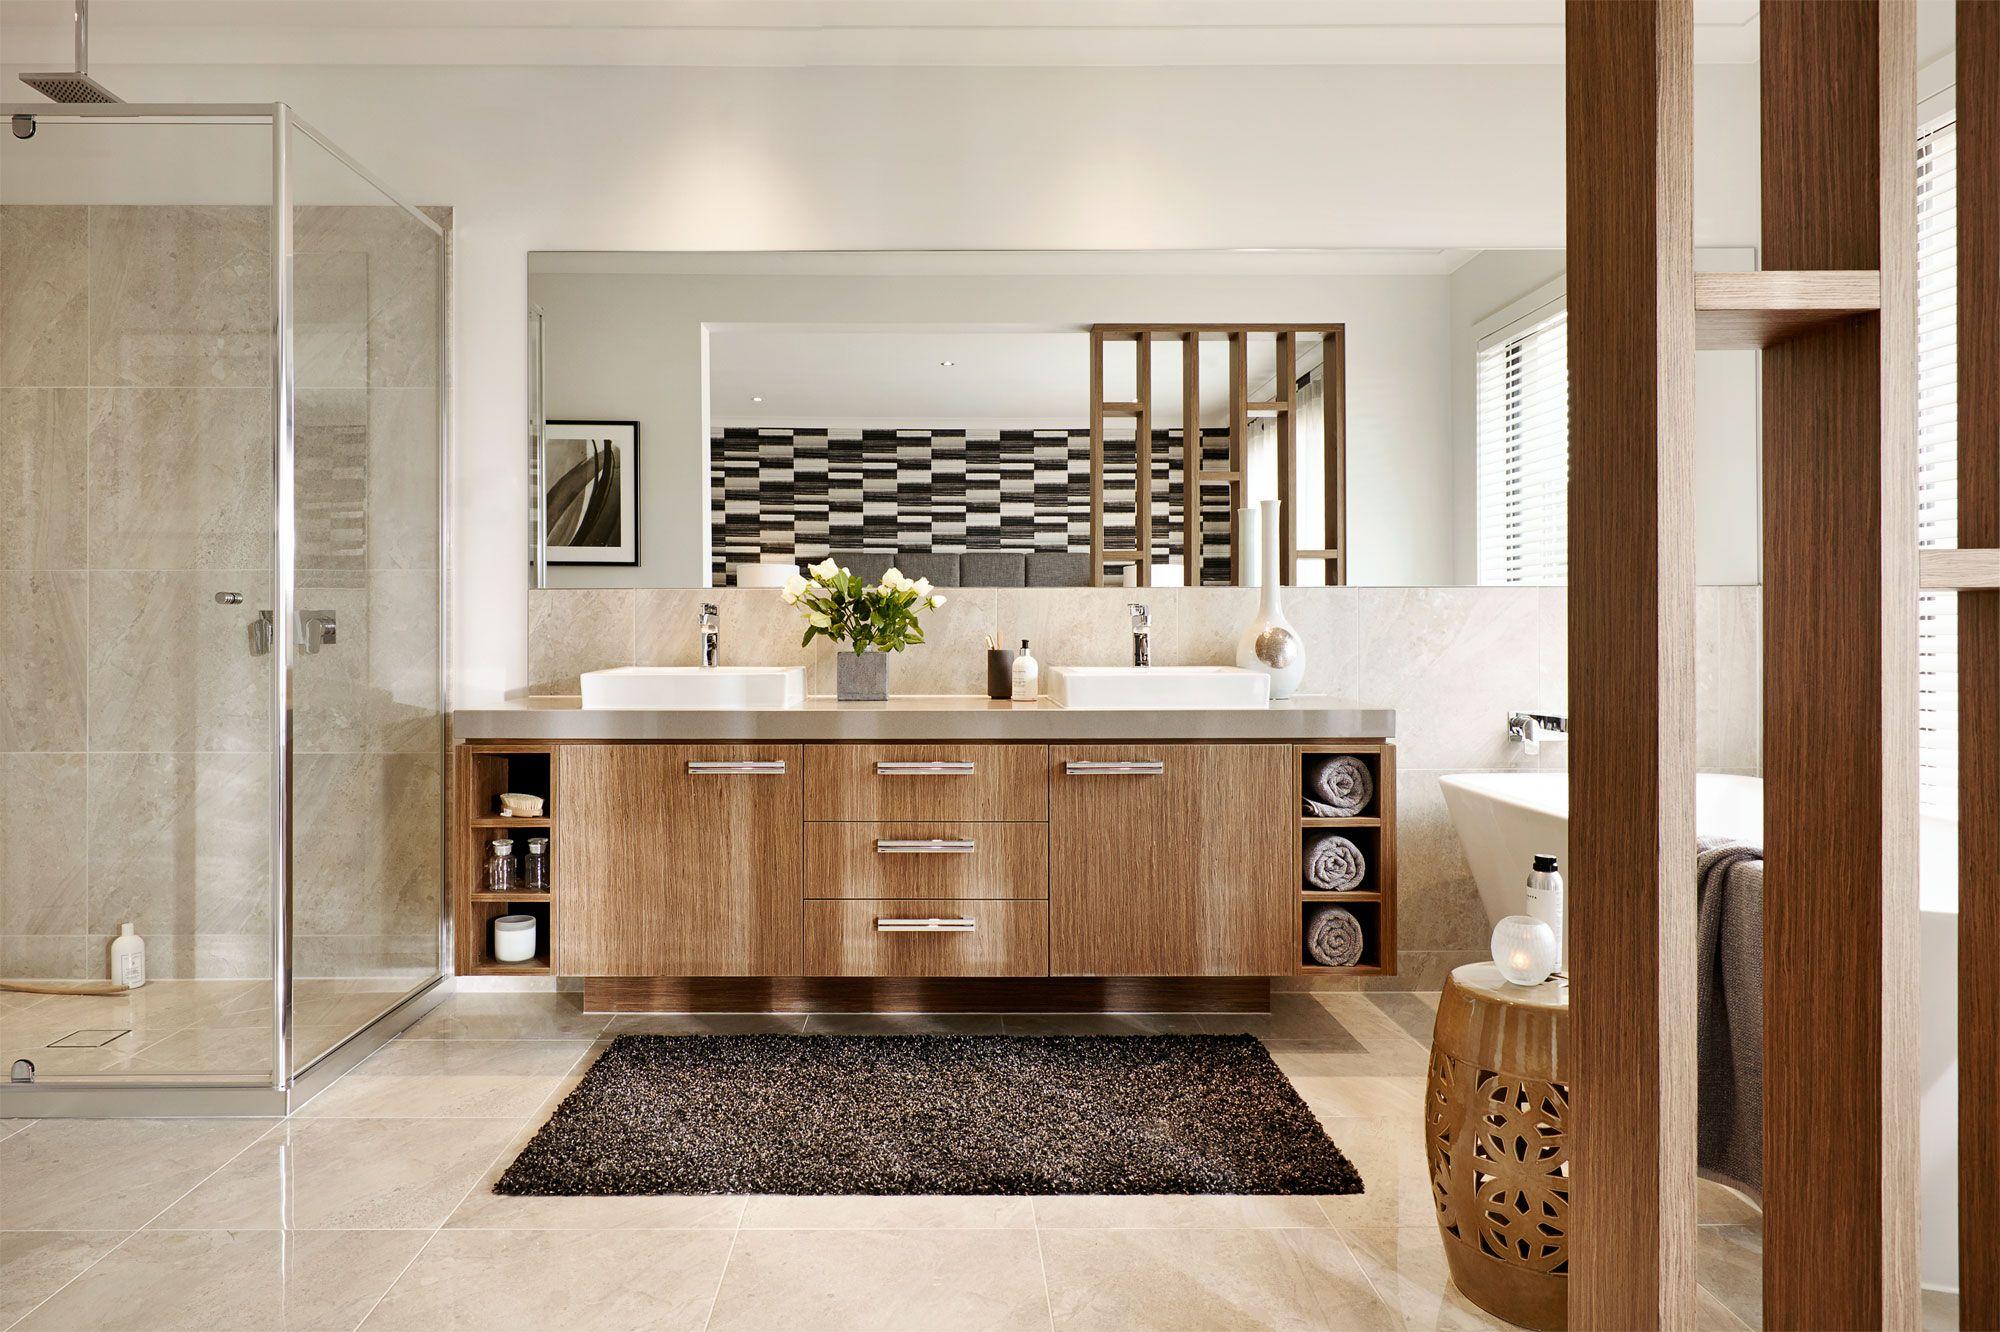 Carlisle Homes Indiana 33 Featured At Somerfield Estate Home Design Decor Master Bathroom Decor Interior Design Gallery